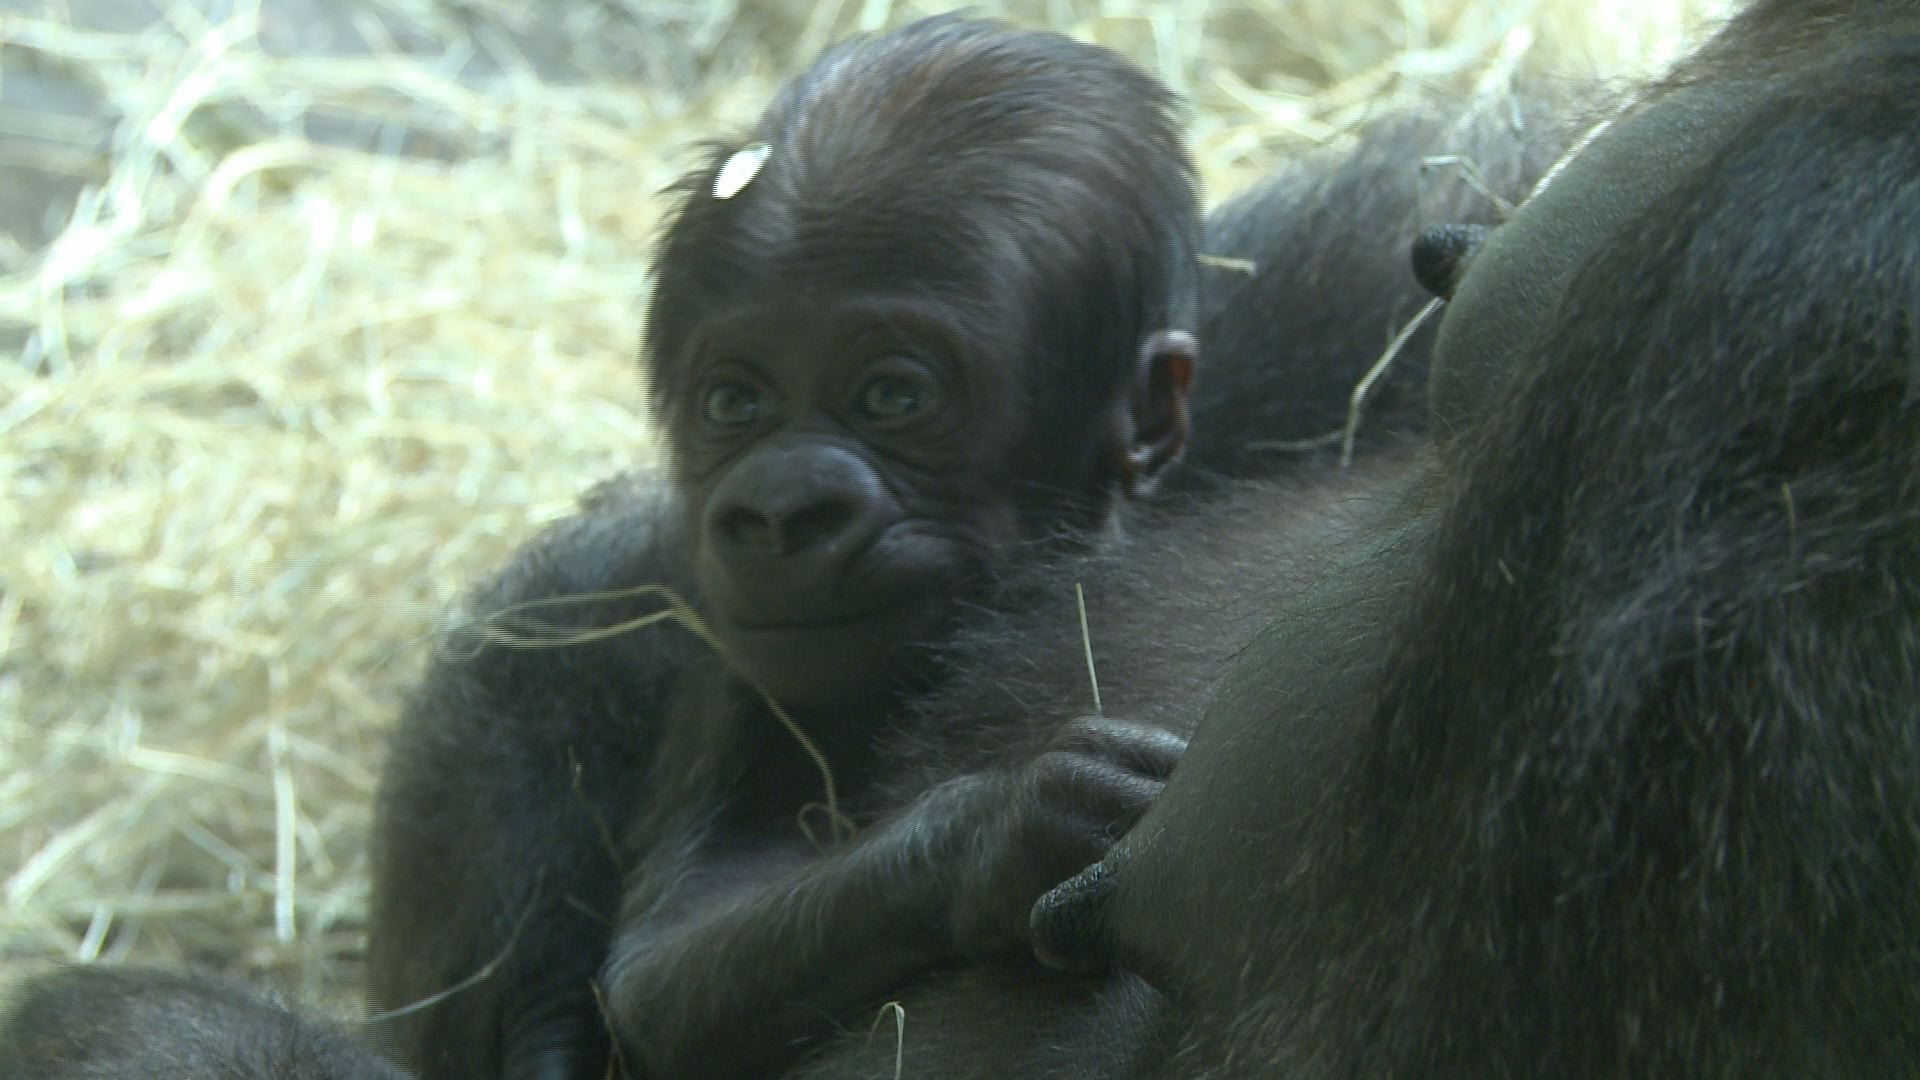 Gorilla For One Gorilla Ver